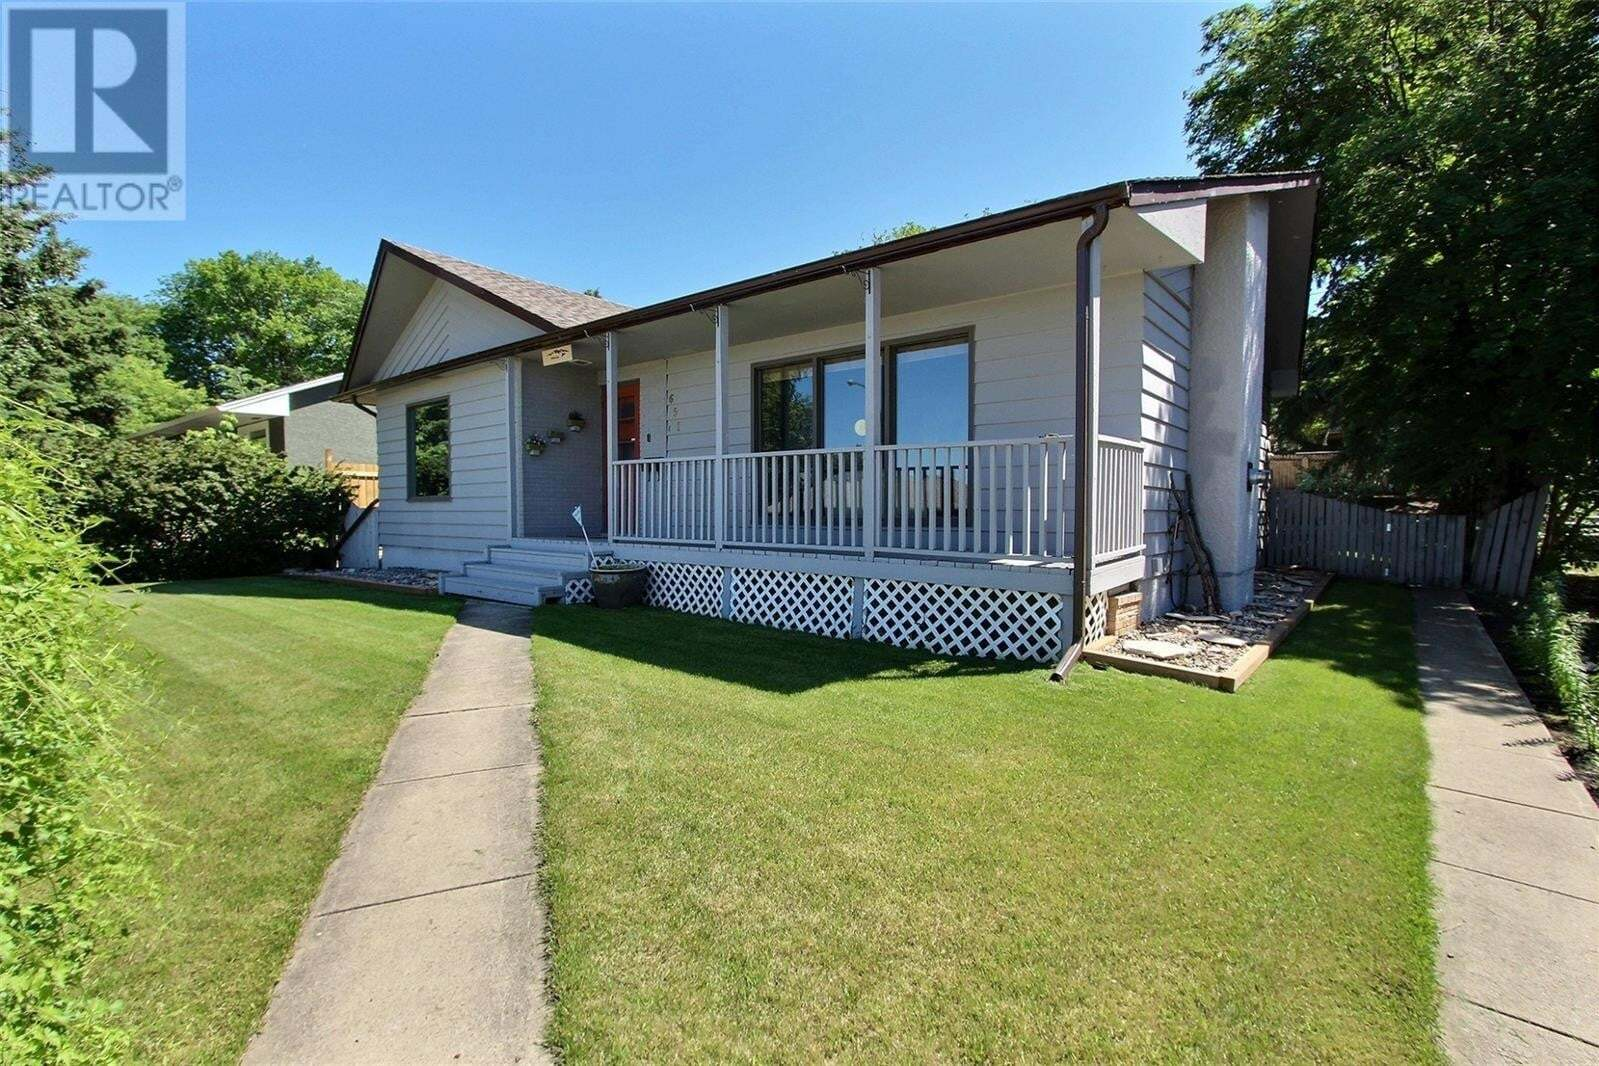 House for sale at 651 19th St W Prince Albert Saskatchewan - MLS: SK824557